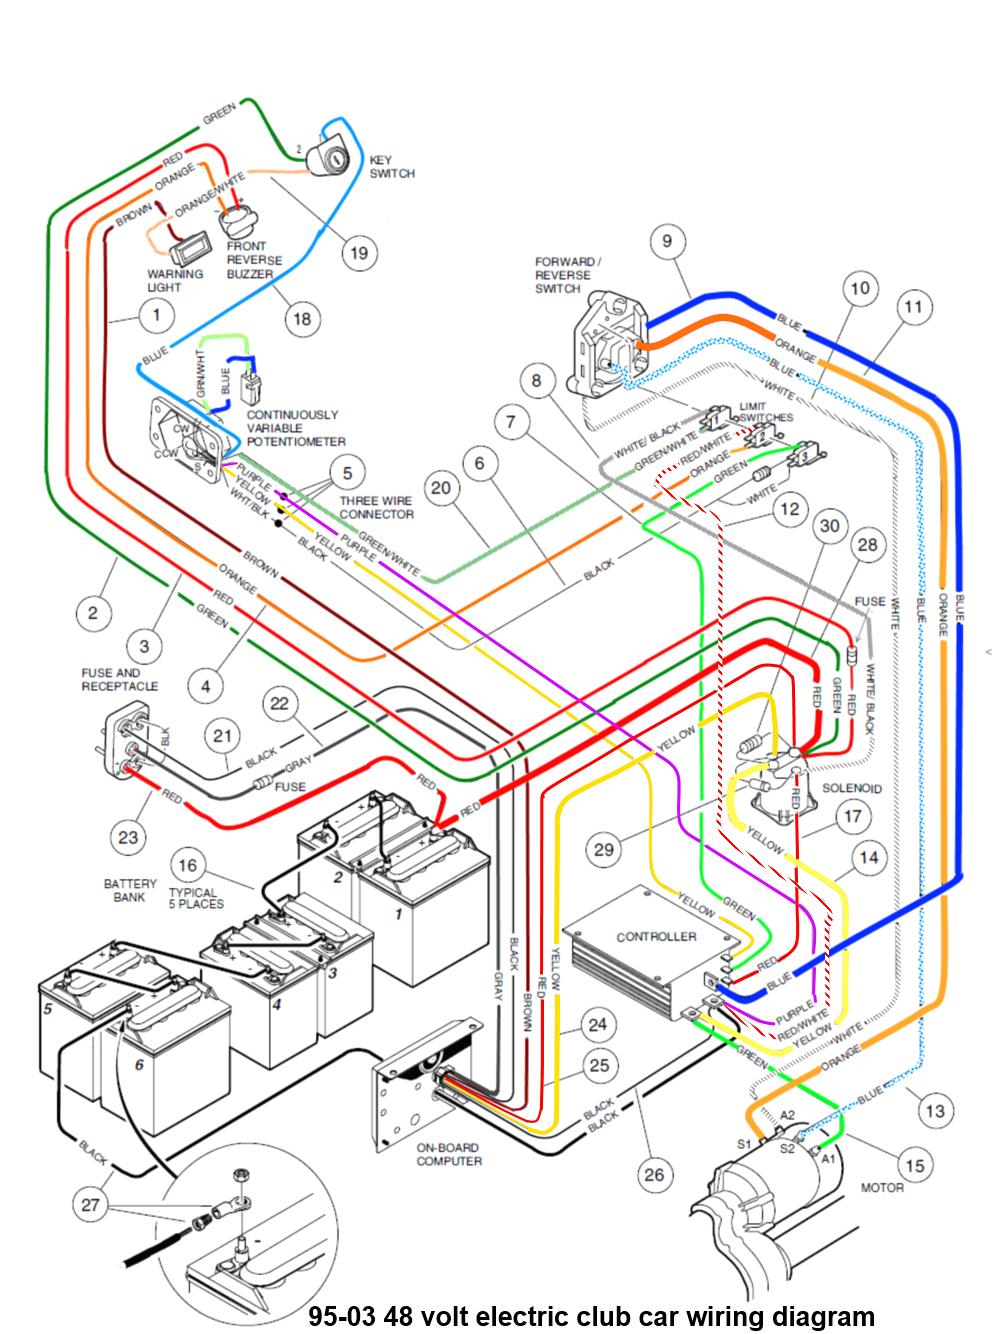 Automotive Wiring Diagram Software - Free Wiring Diagram Collection - Automotive Wiring Diagram Software